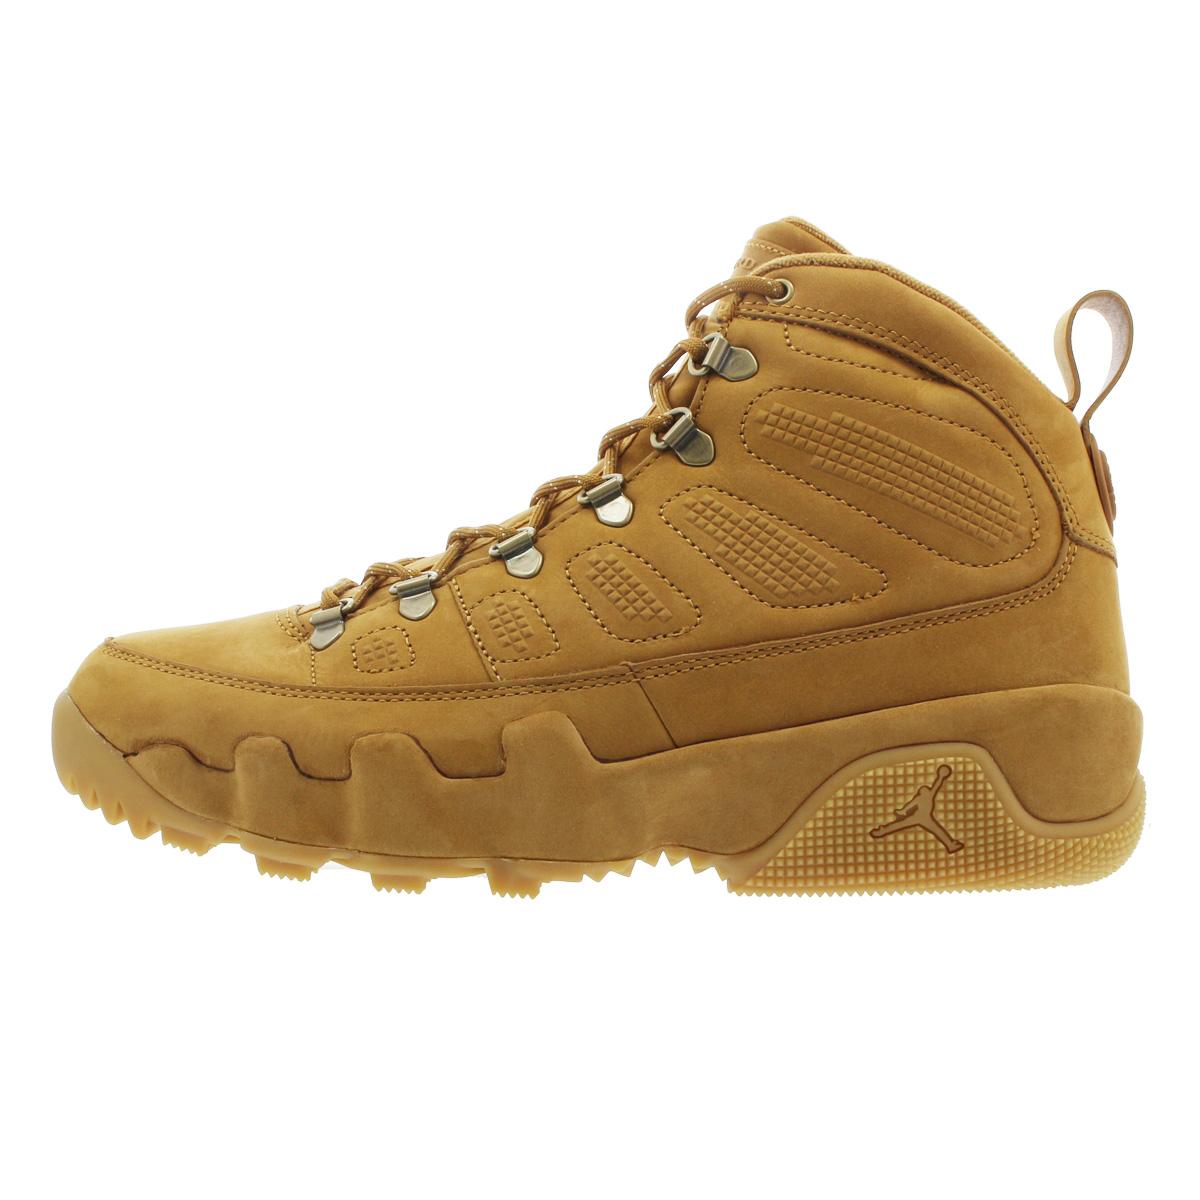 new style 65b82 144be NIKE AIR JORDAN 9 RETRO NRG Nike air Jordan 9 nostalgic NRG  WHEAT/WHEAT/BAROQUE BROWN ar4491-700